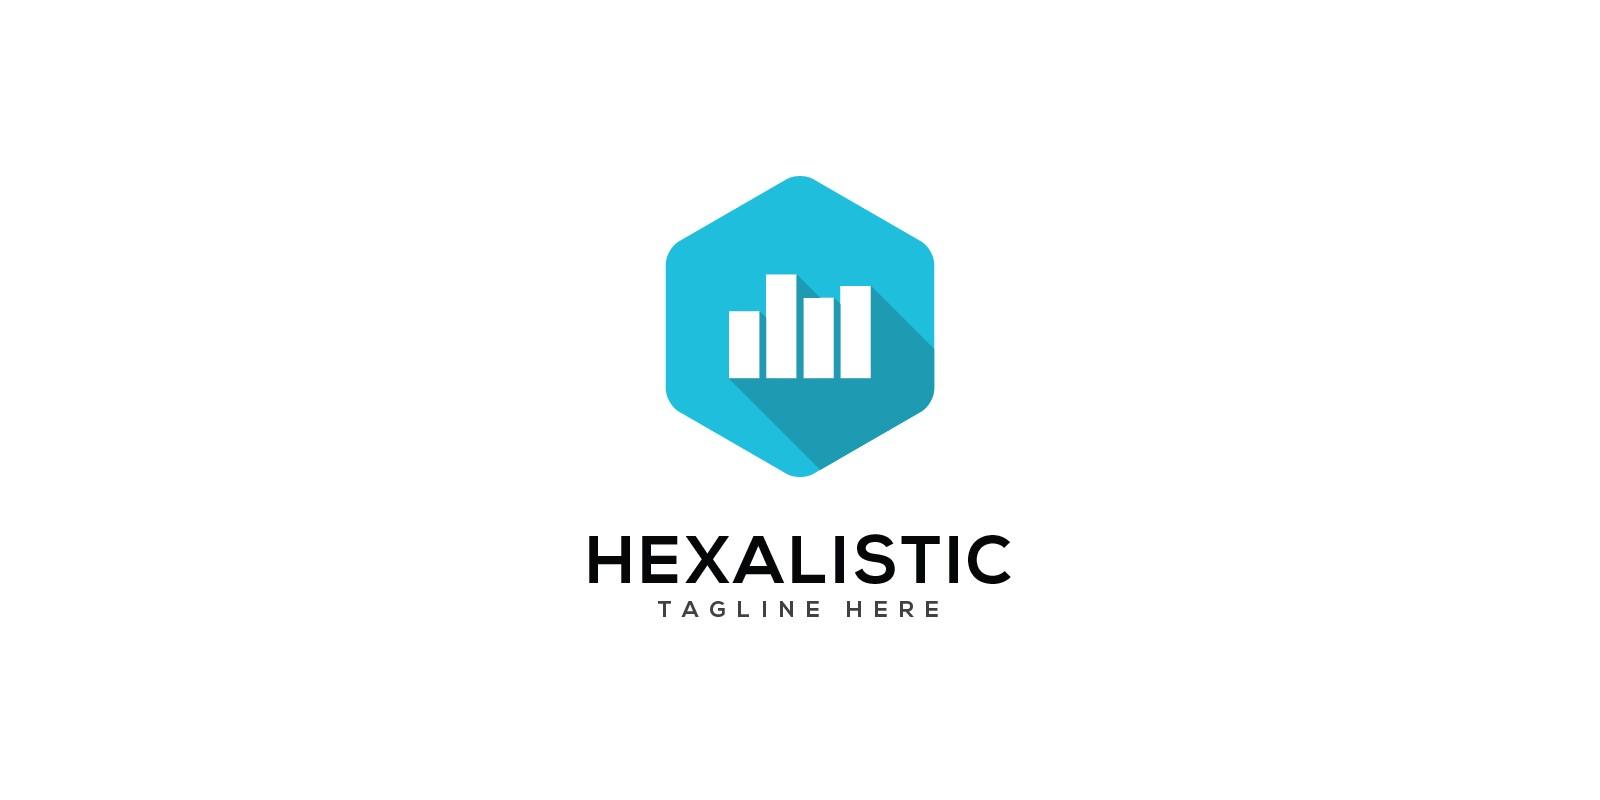 Hexalistic Logo